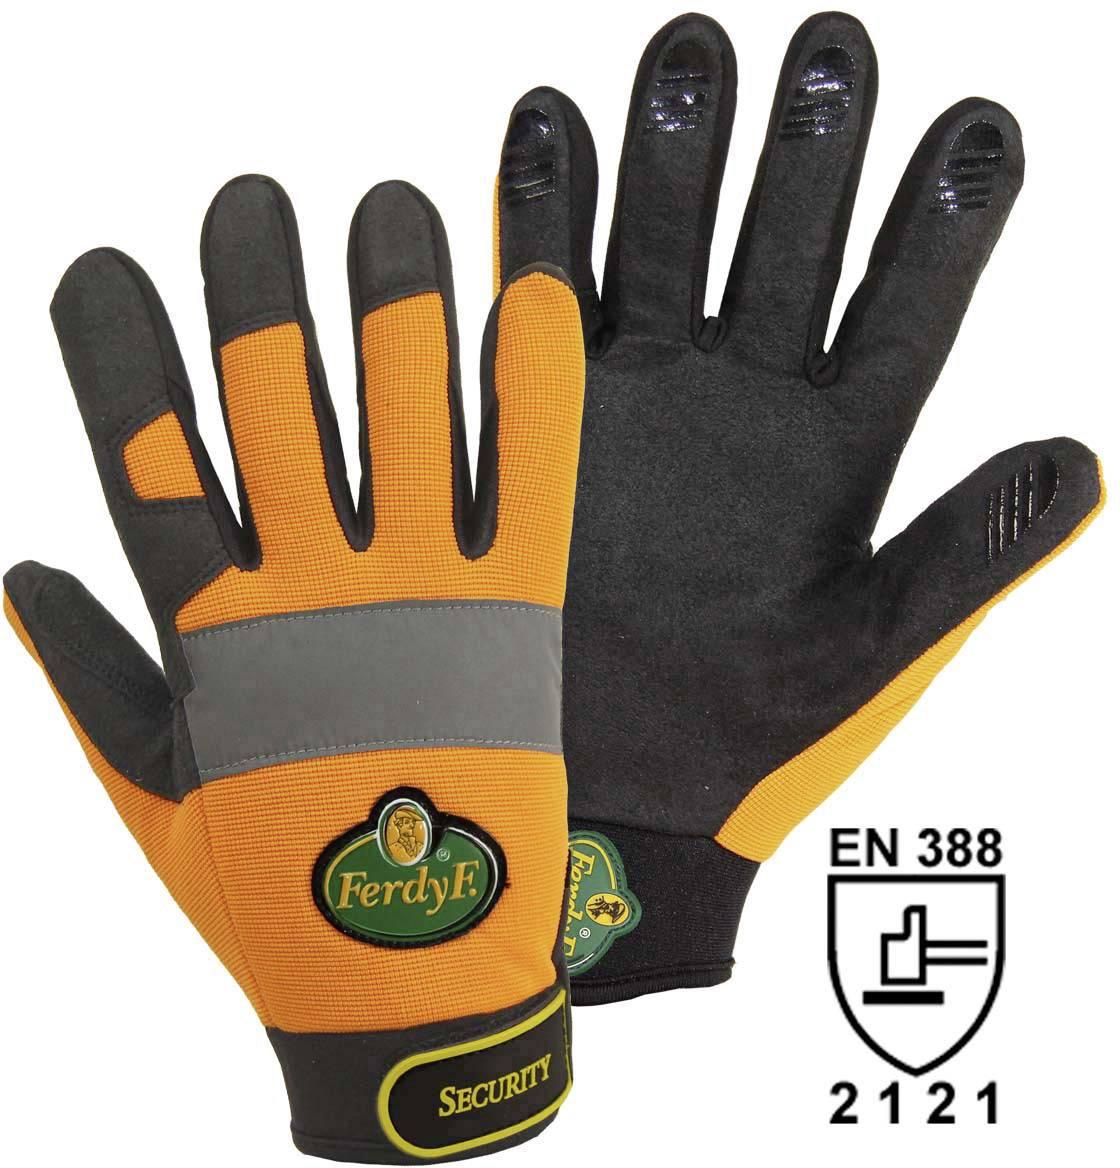 Montážne rukavice FerdyF. Mechanics Security 1905, velikost rukavic: 8, M